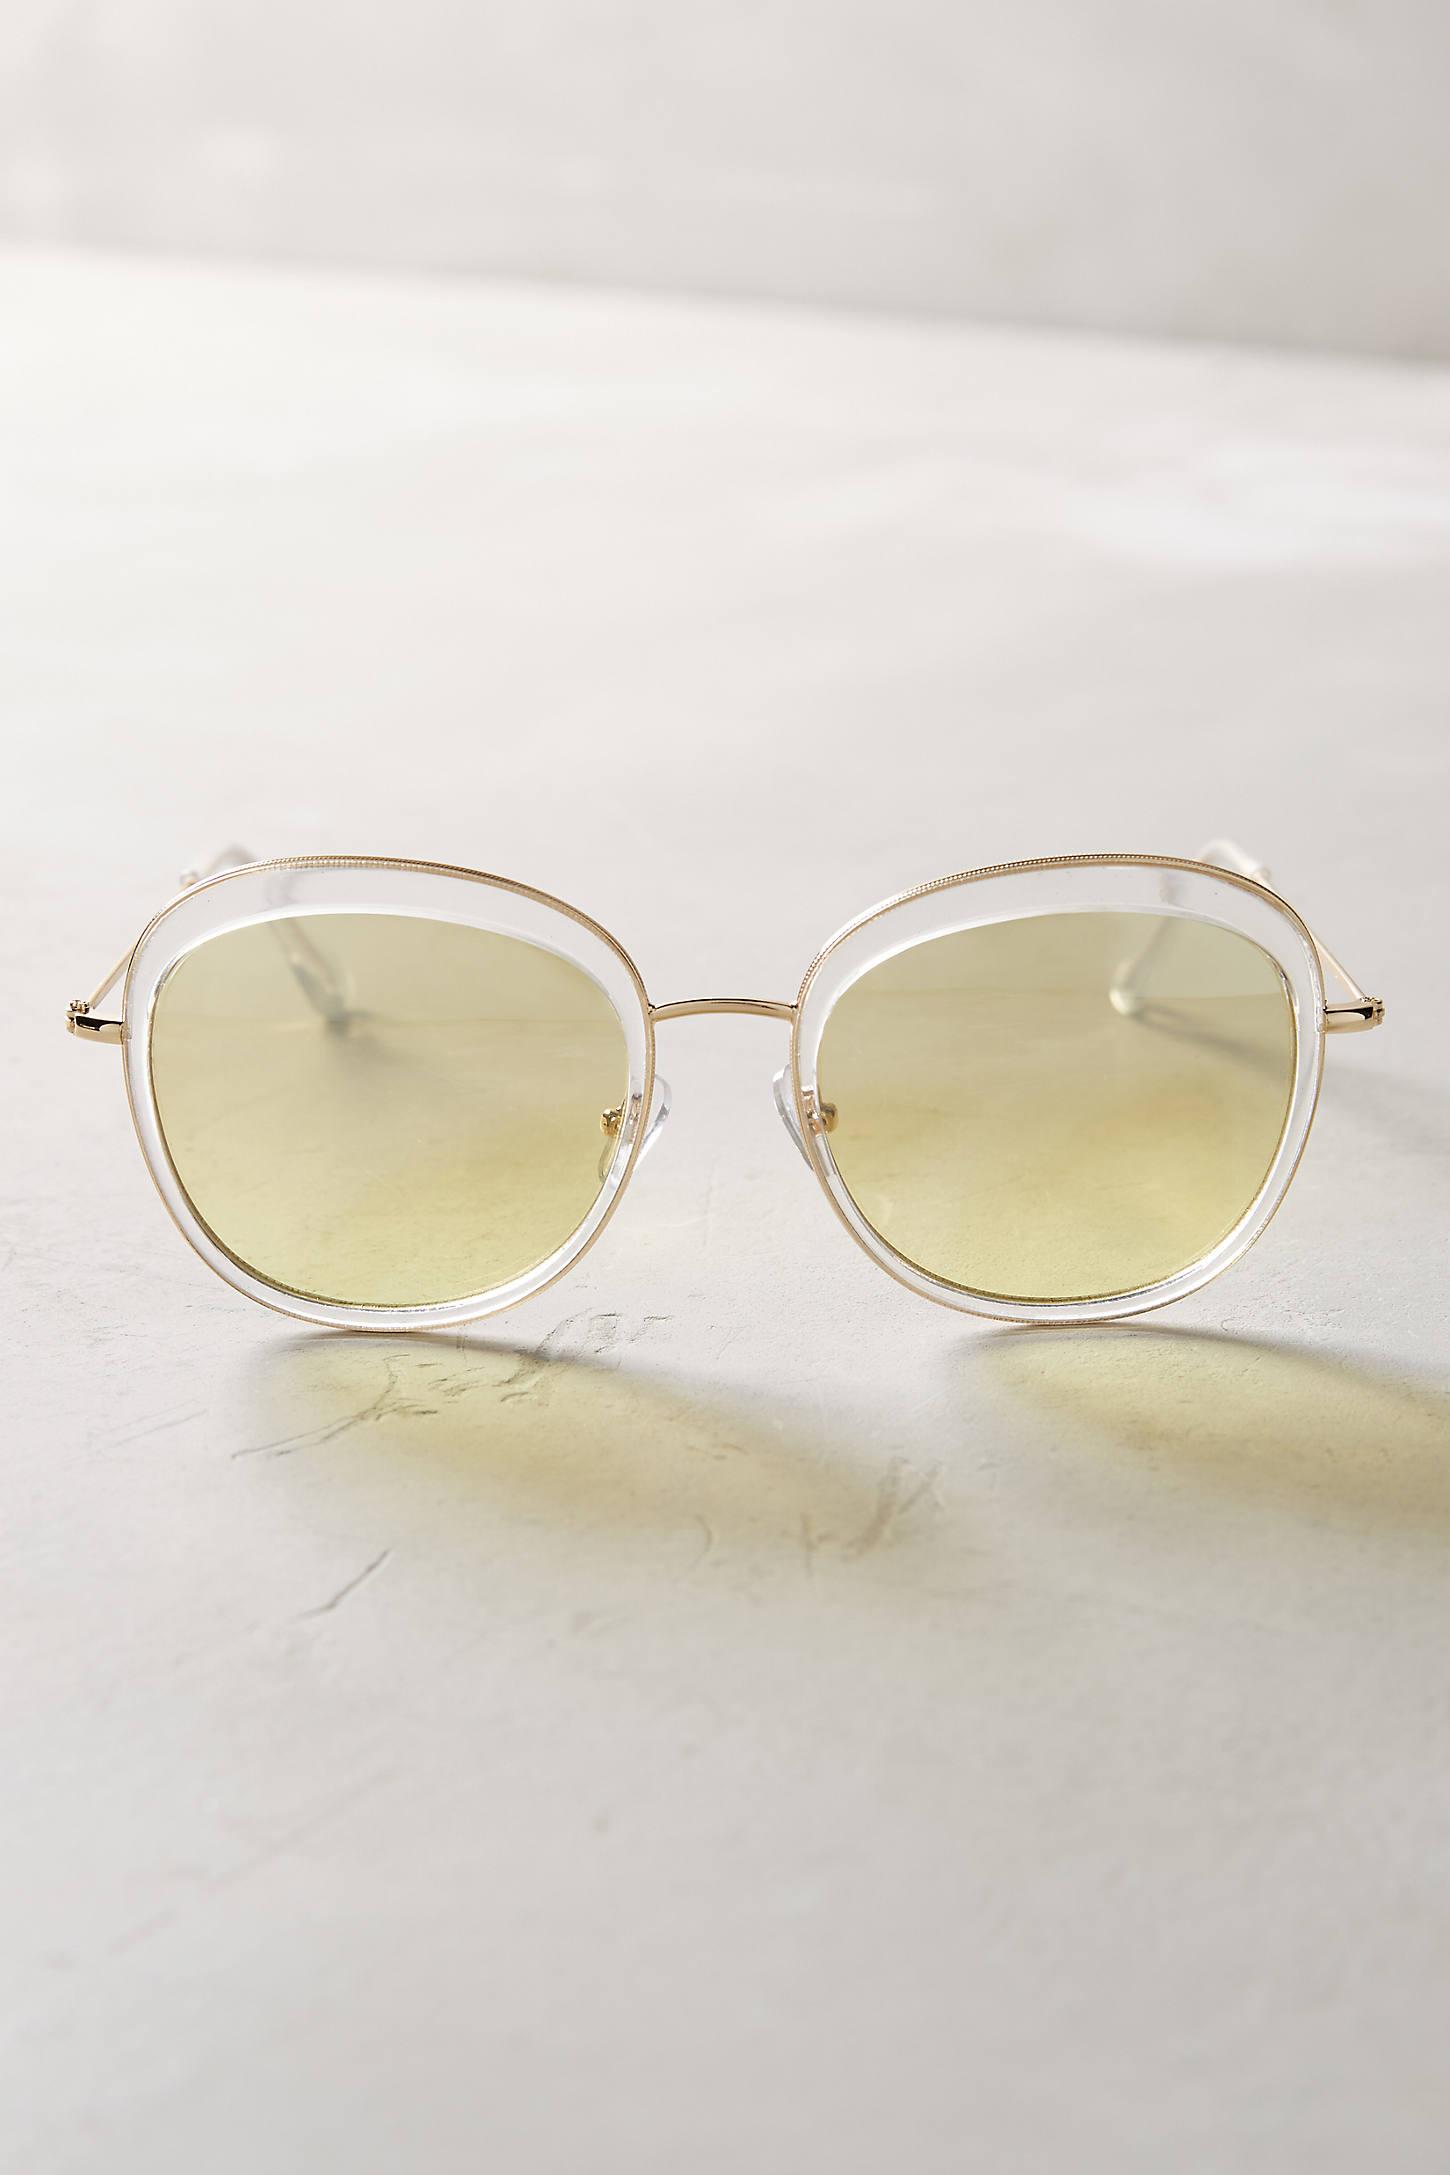 Veranda Sunglasses